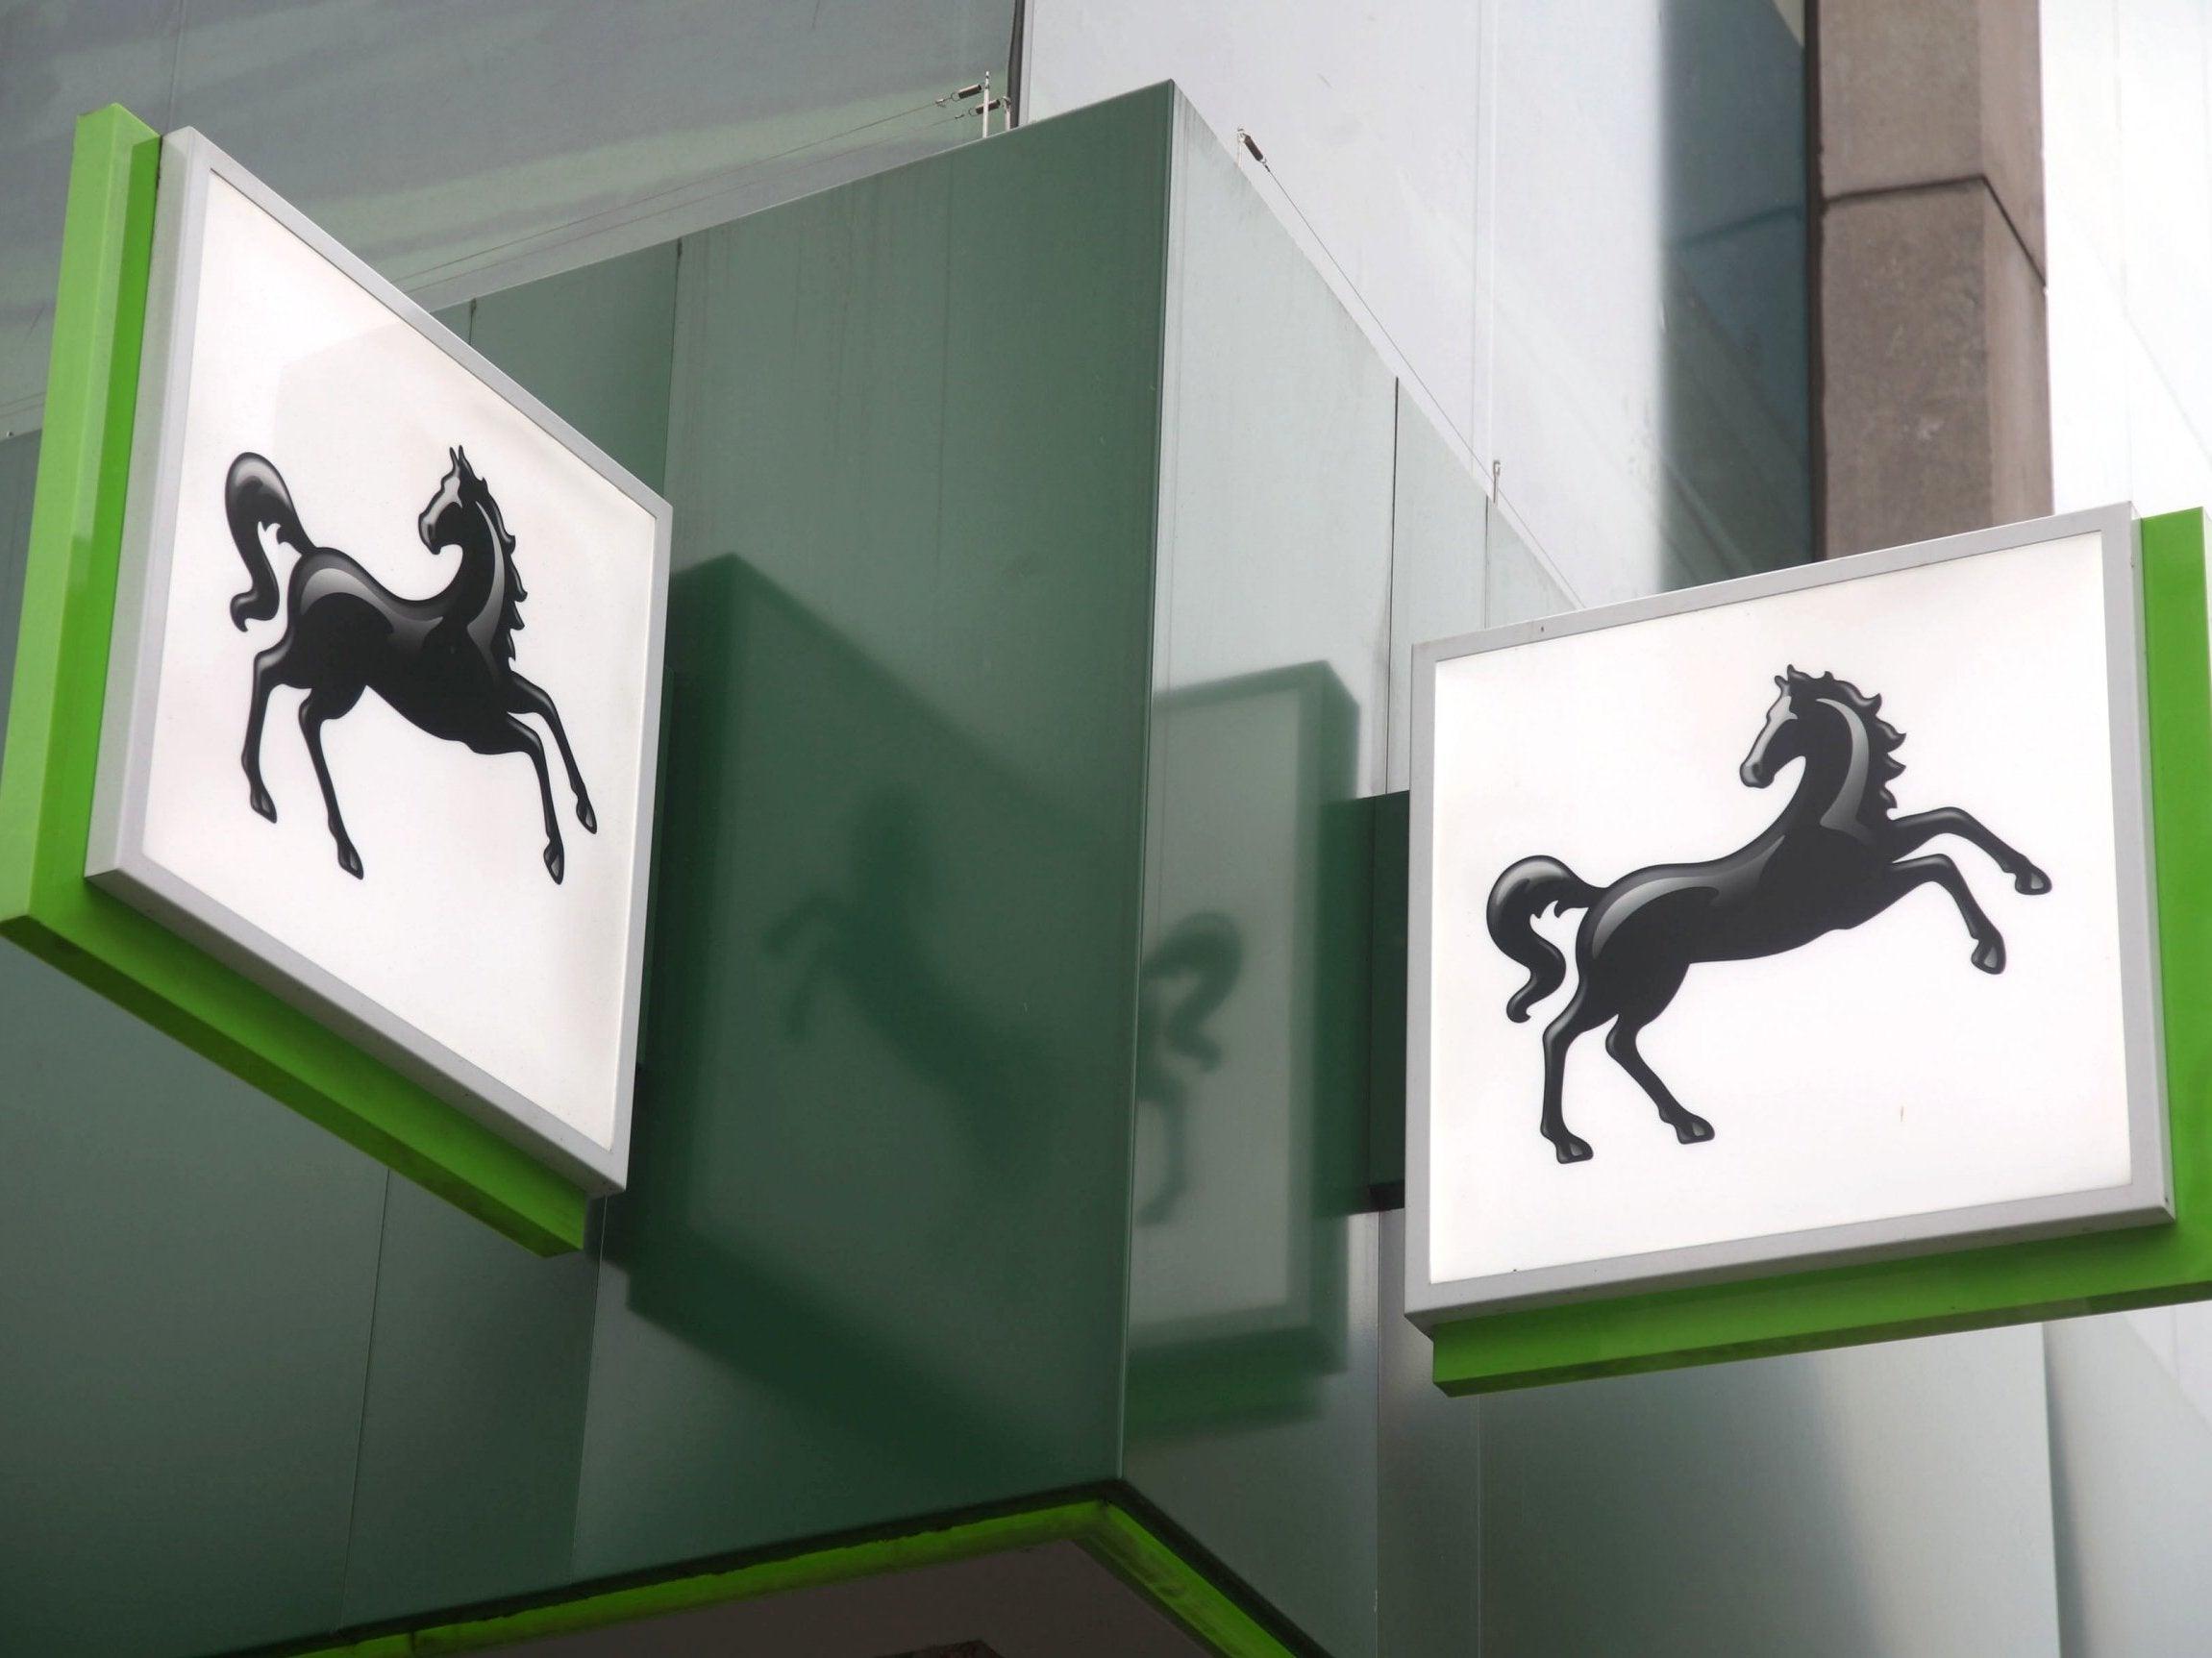 Lloyds freezes 8,000 offshore bank accounts after money laundering c…